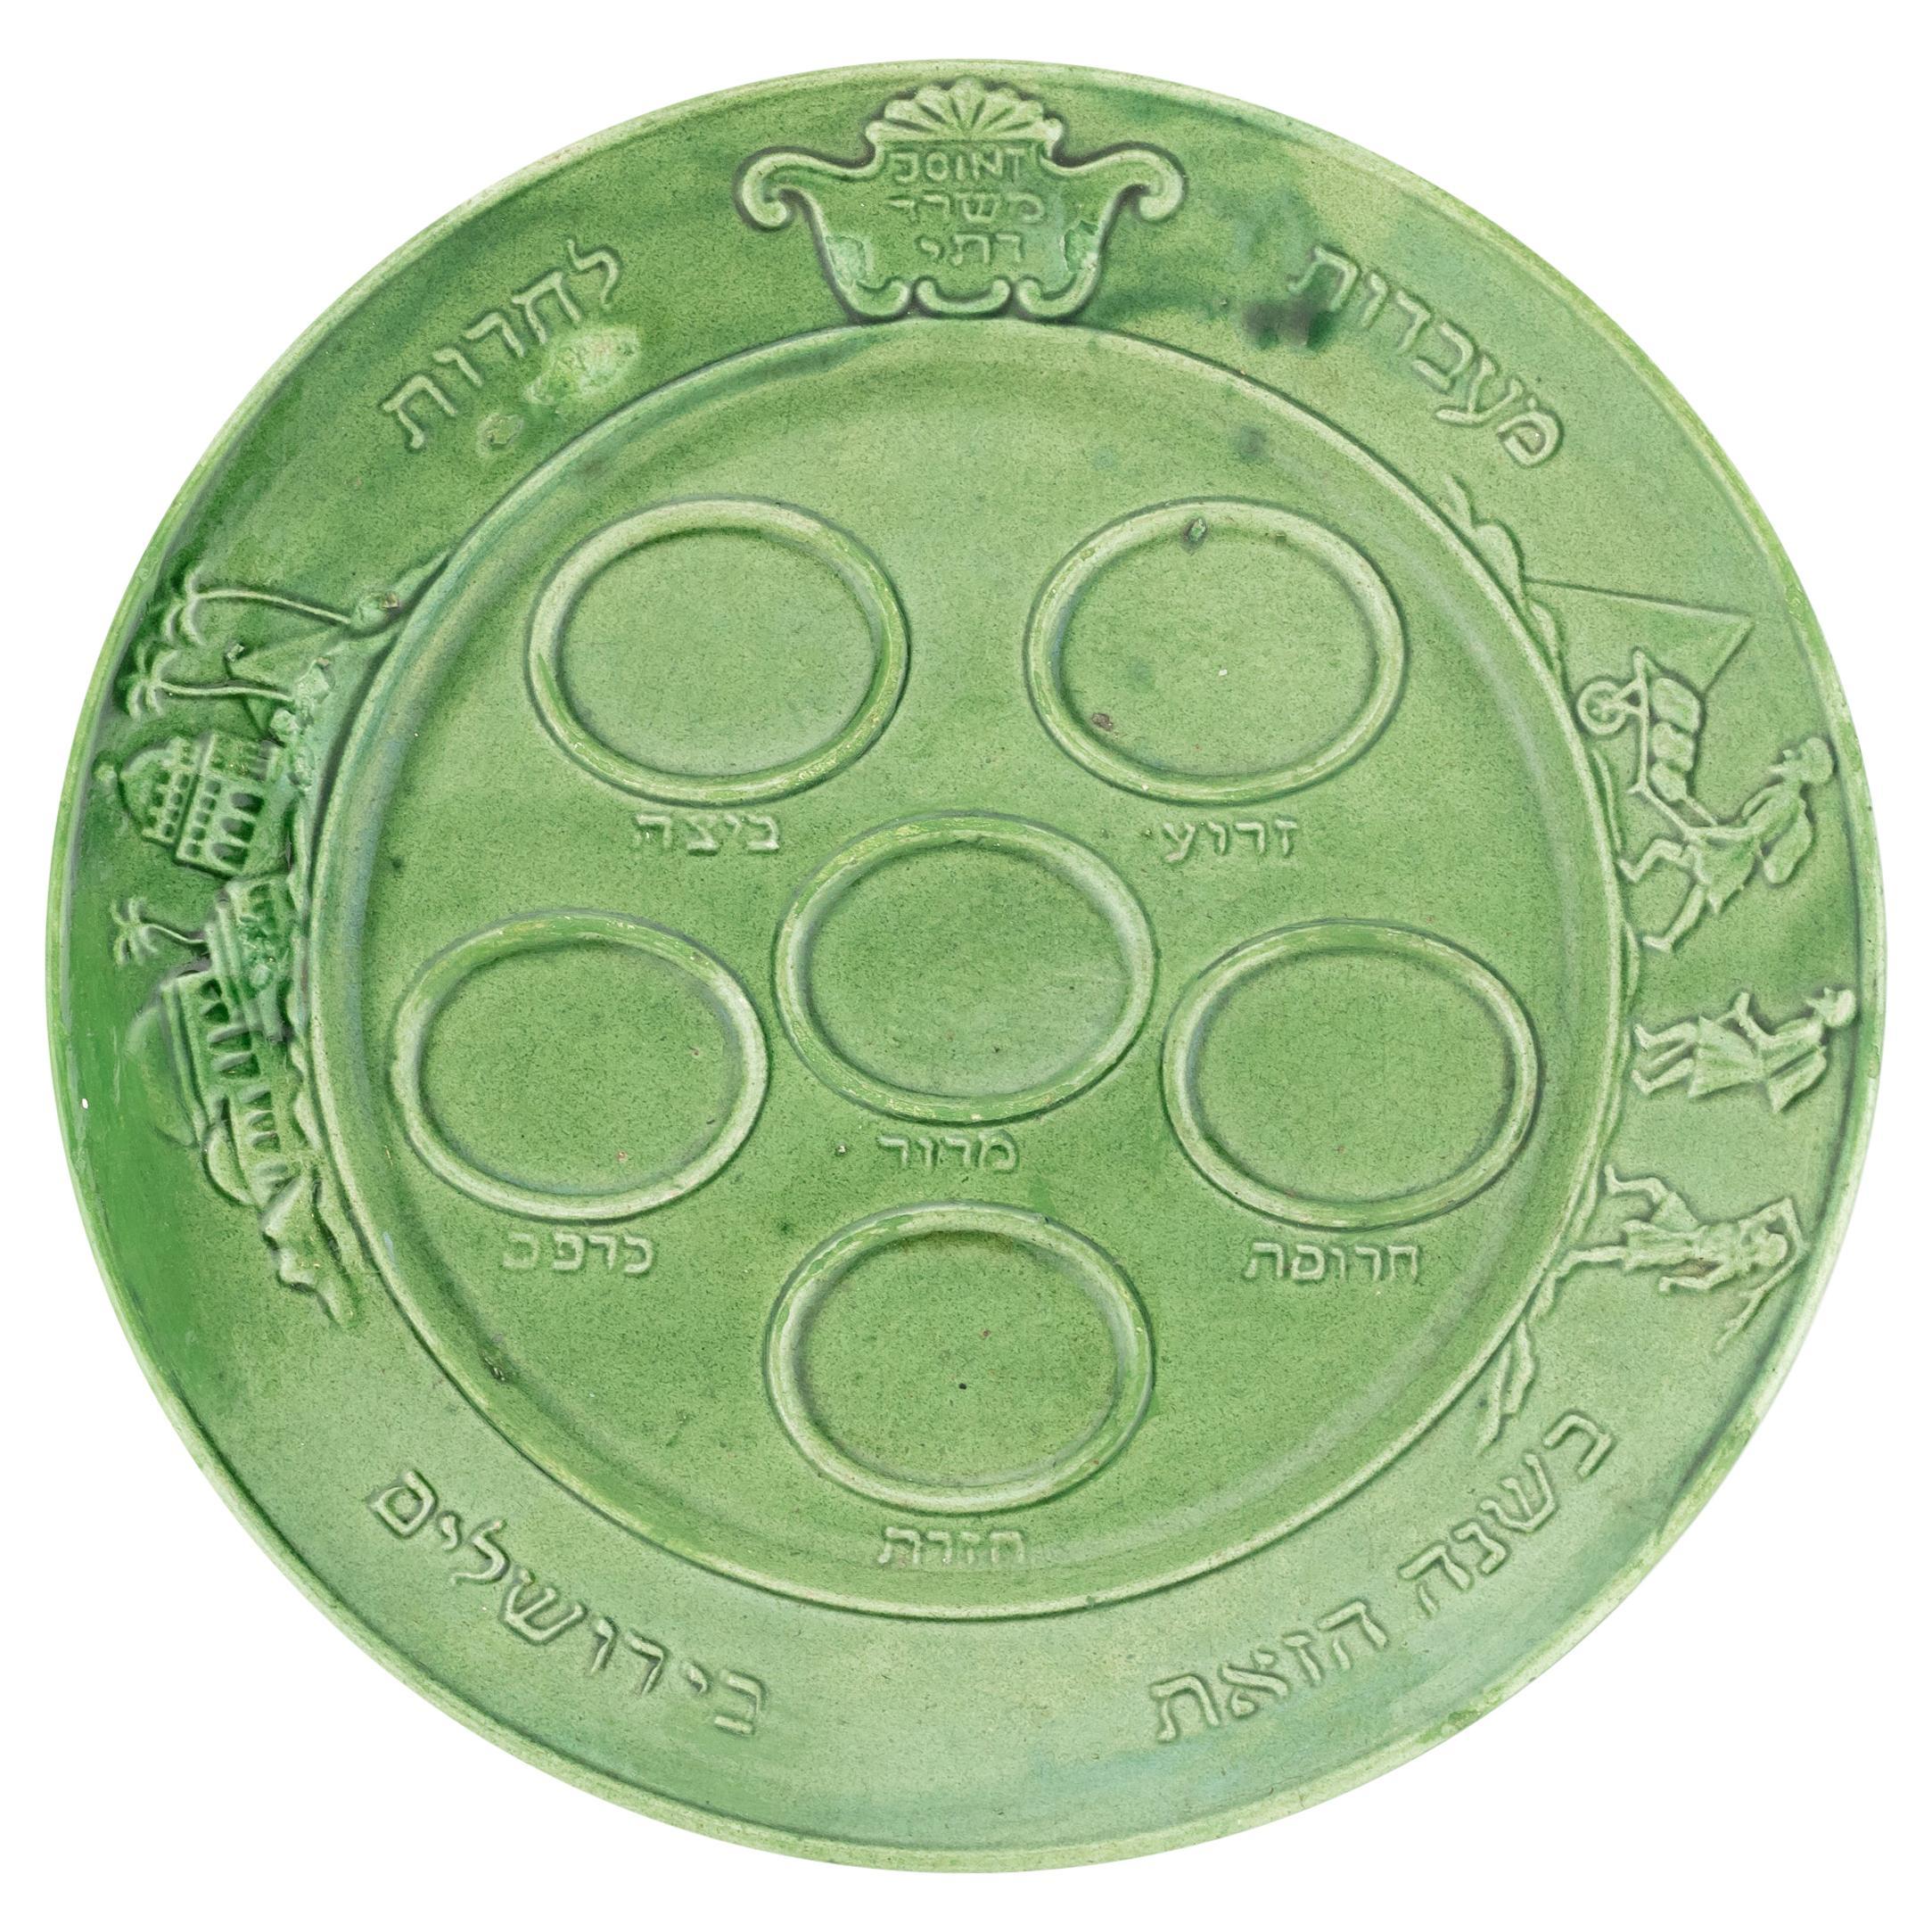 Post World War II Green Gazed Earthenware Passover Seder Plate